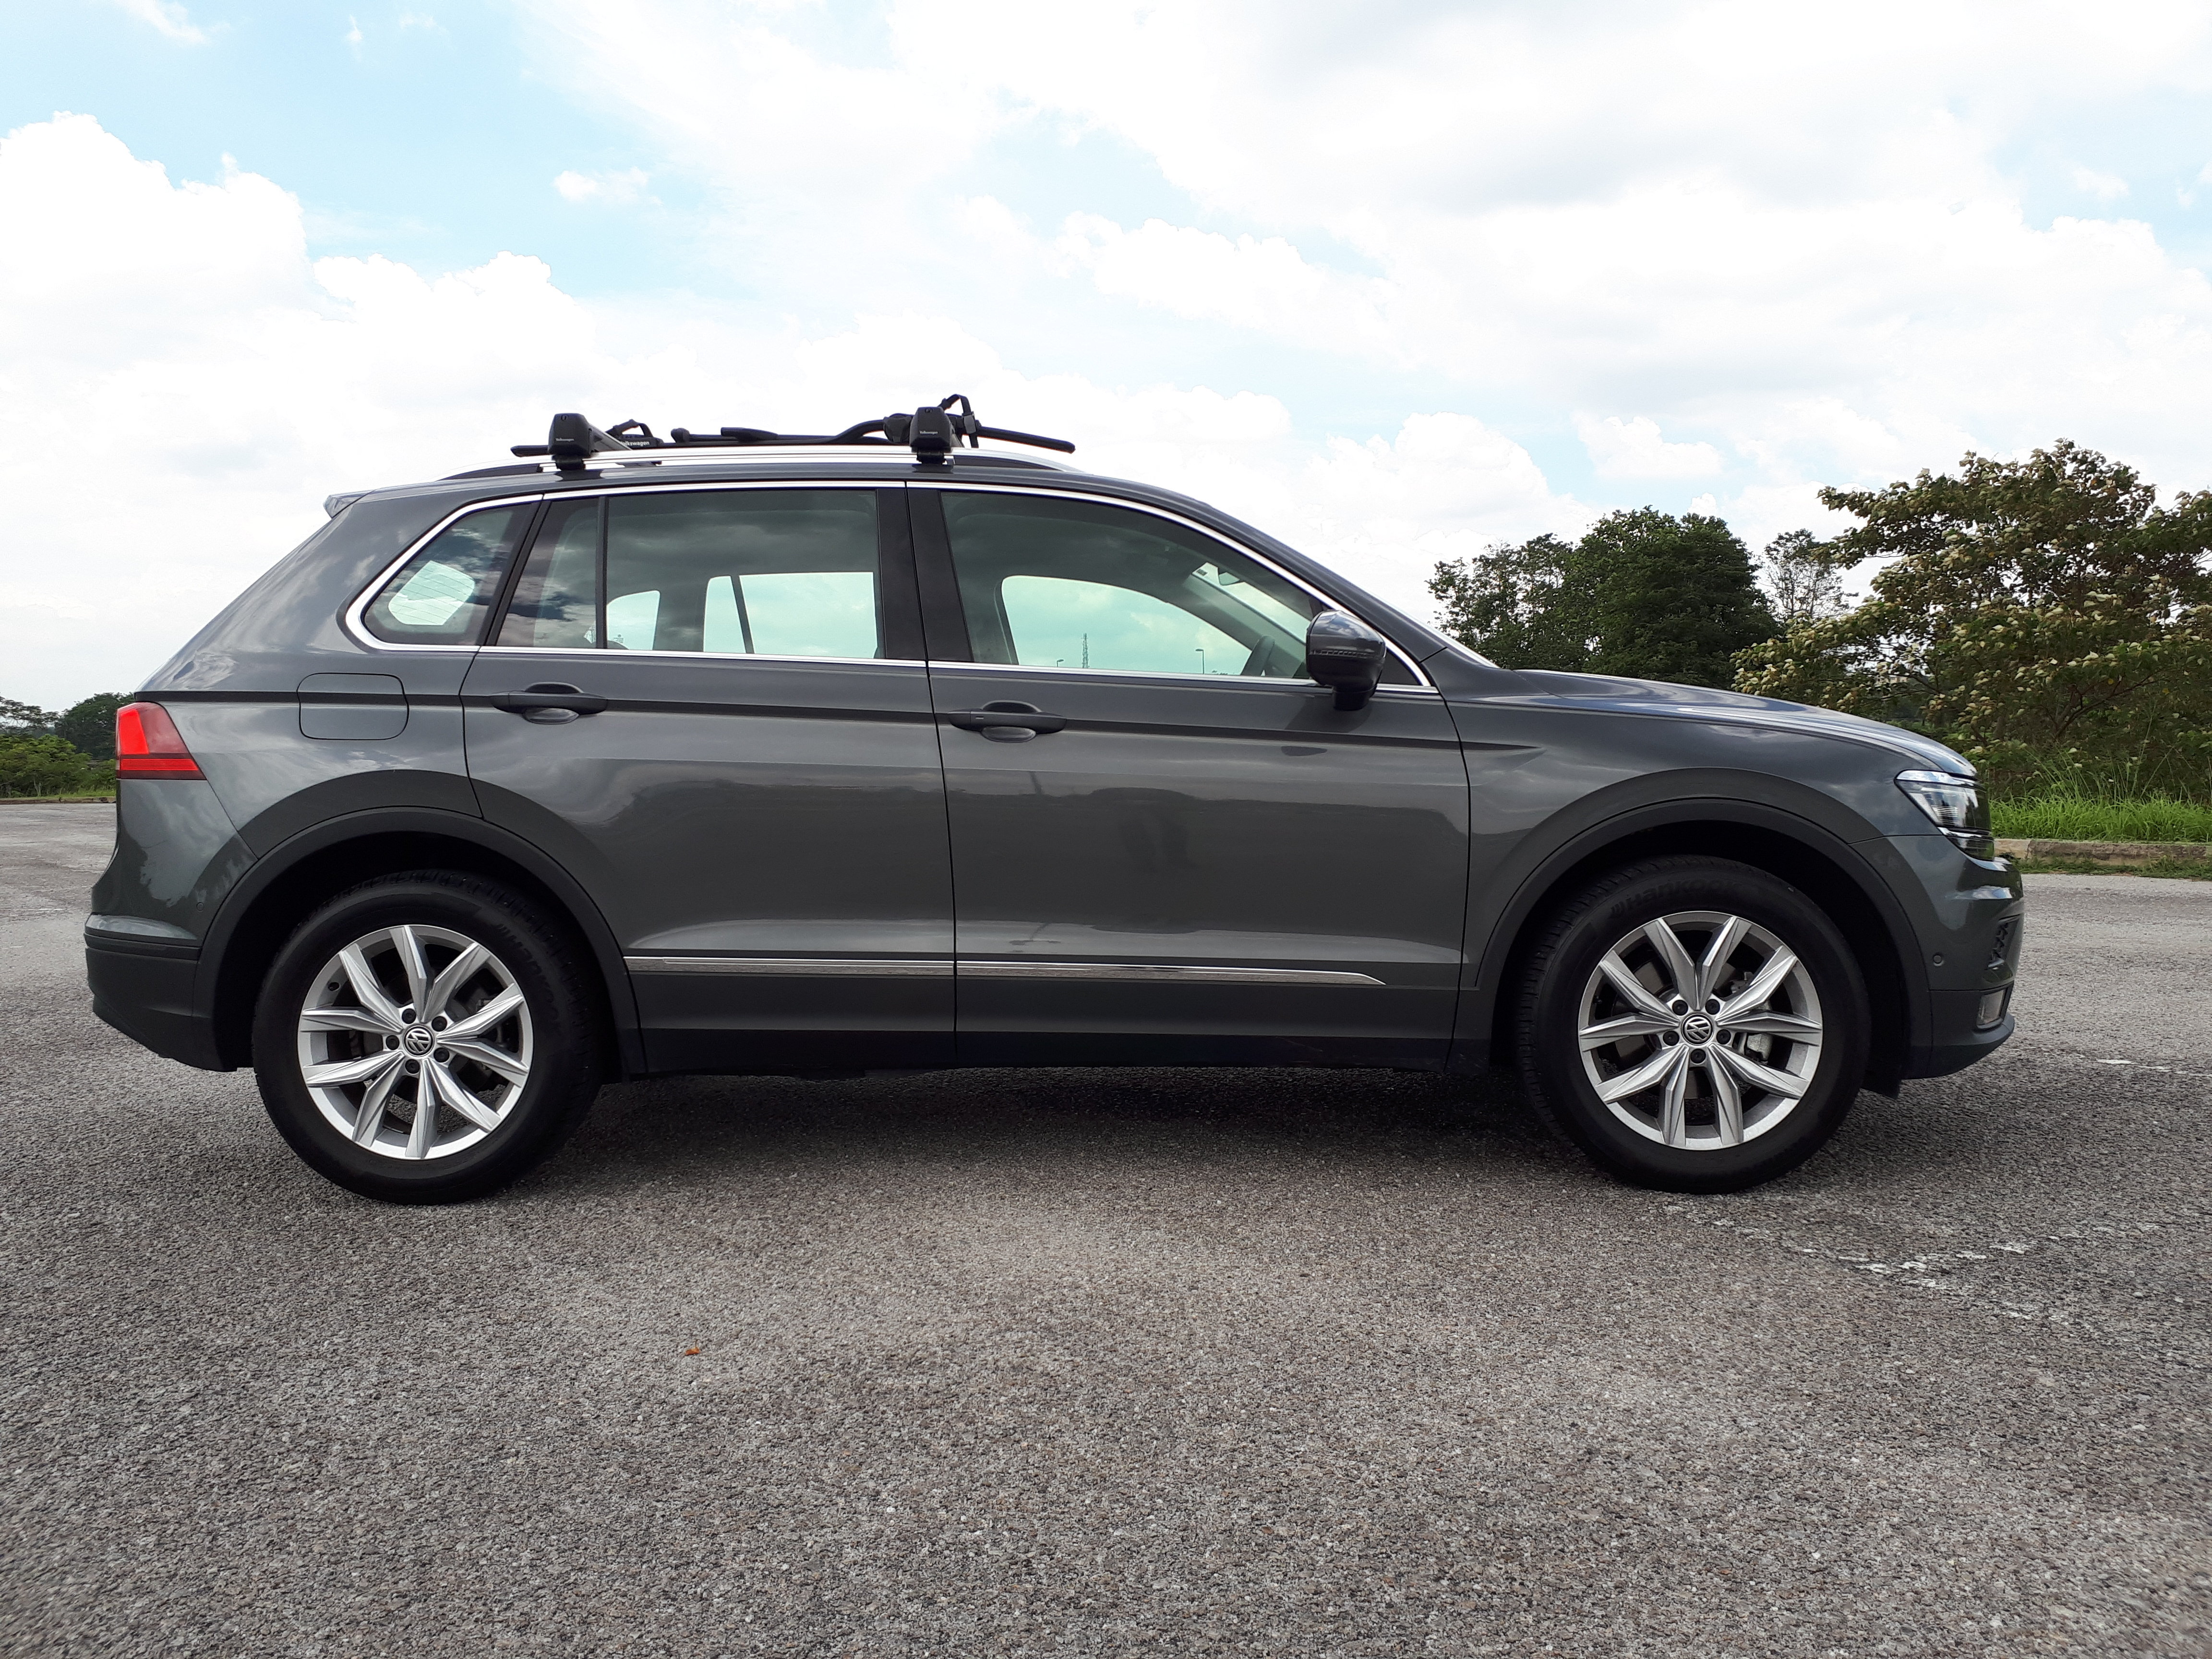 REVIEWED: Volkswagen Tiguan 1 4 TSi - Sit Down, Buckle Up